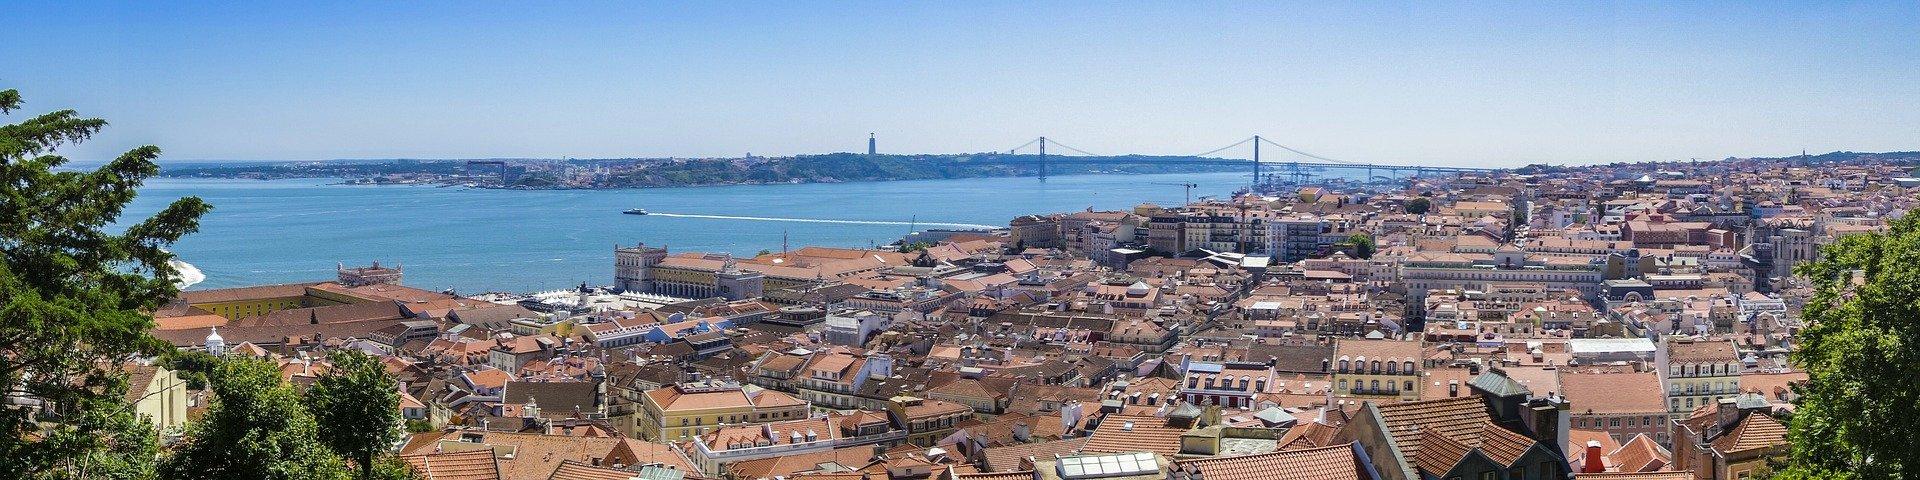 Gran Tour del Portogallo e Santiago de Compostela